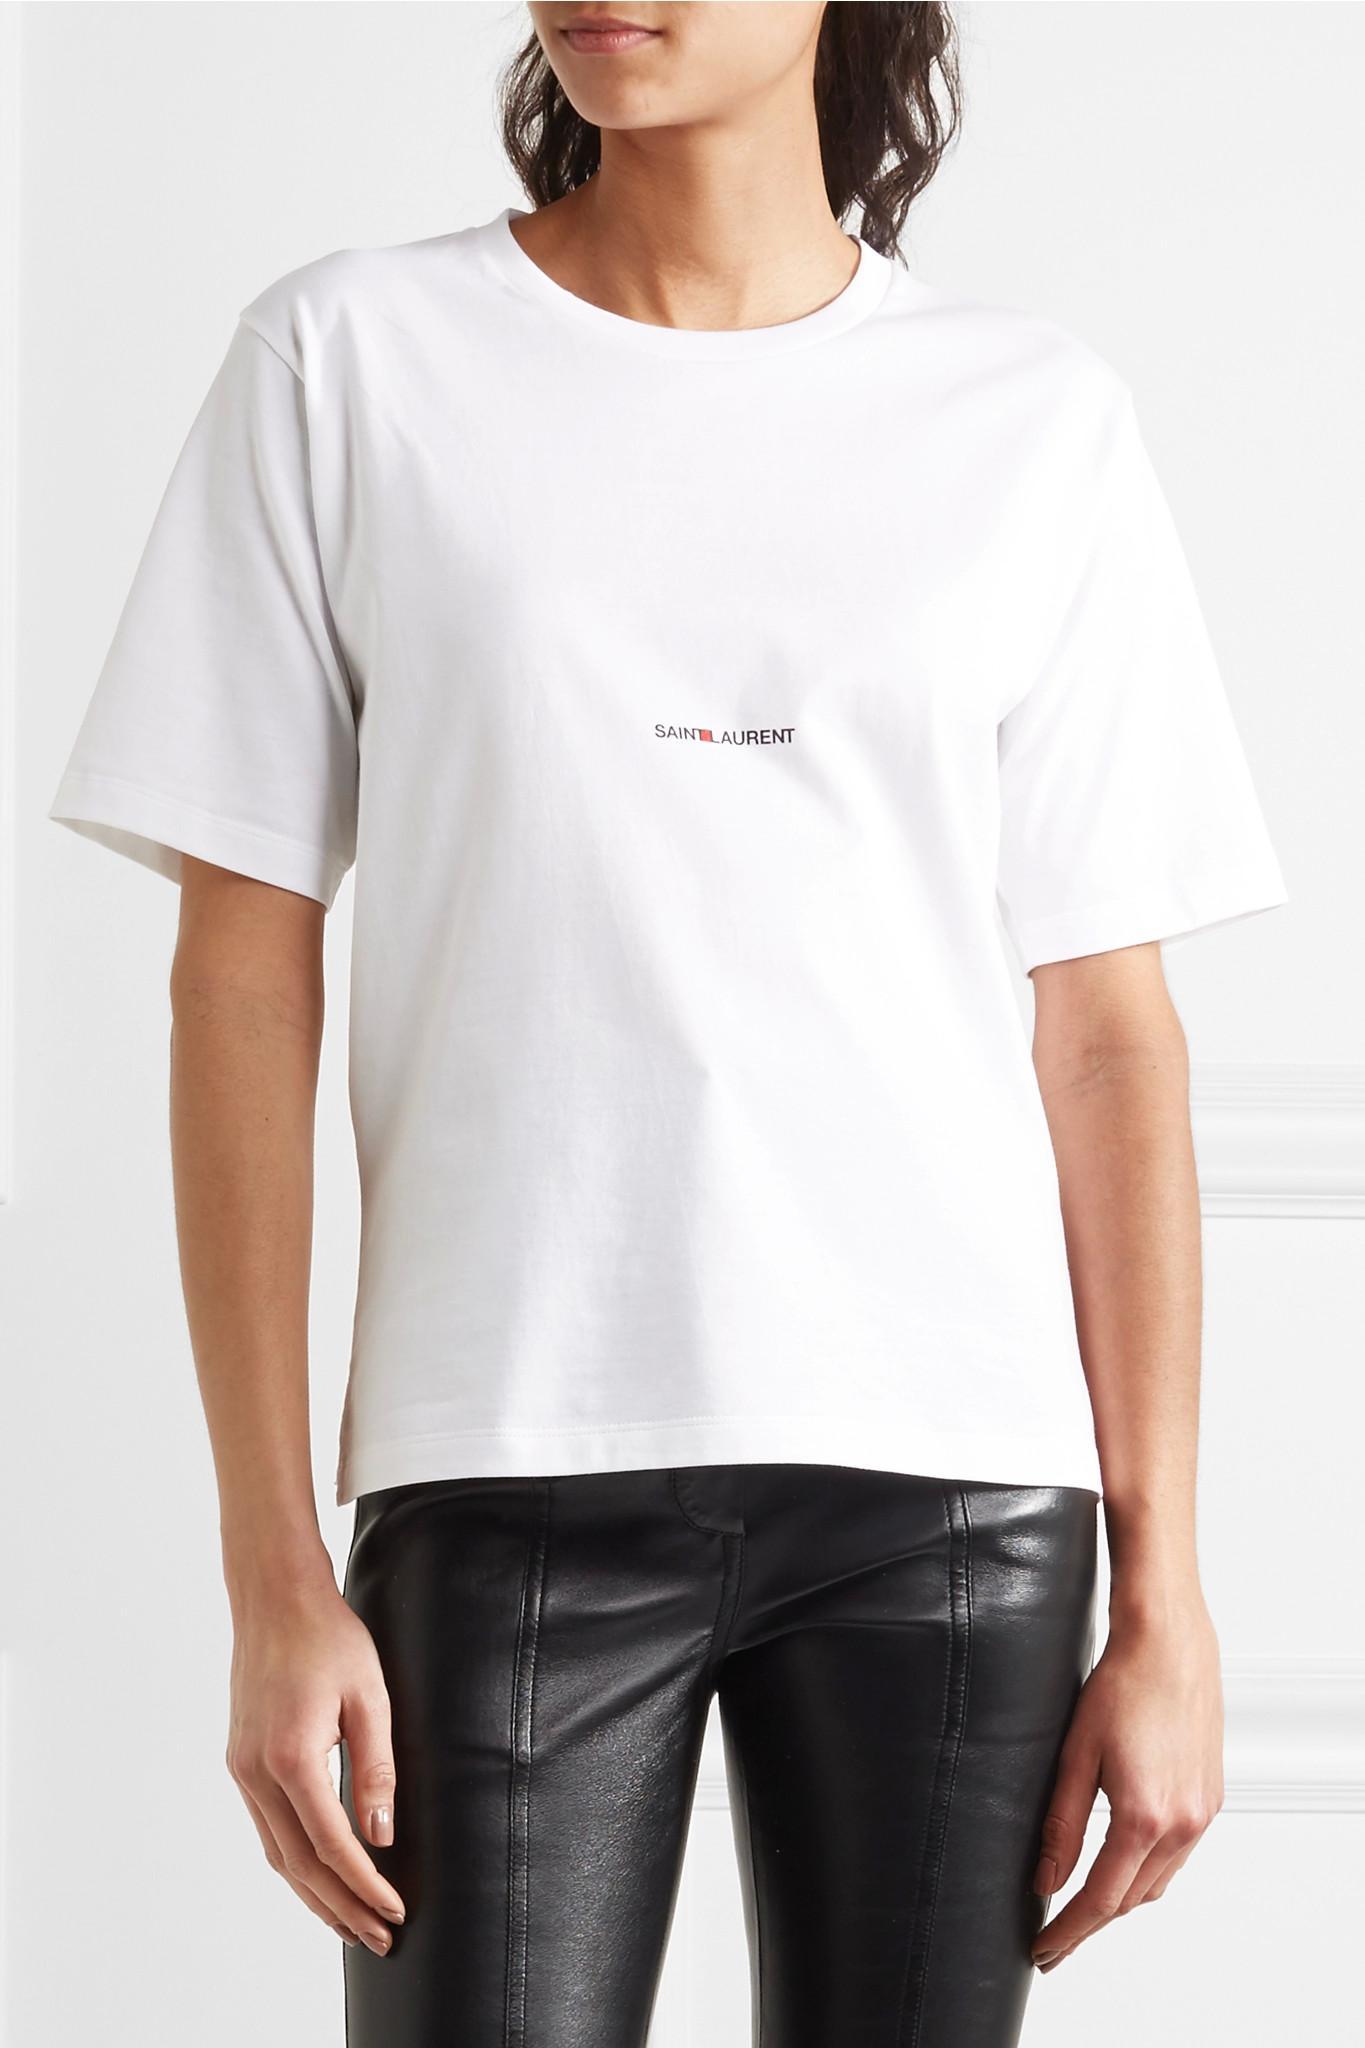 Saint laurent printed cotton jersey t shirt in white lyst for Saint laurent shirt womens